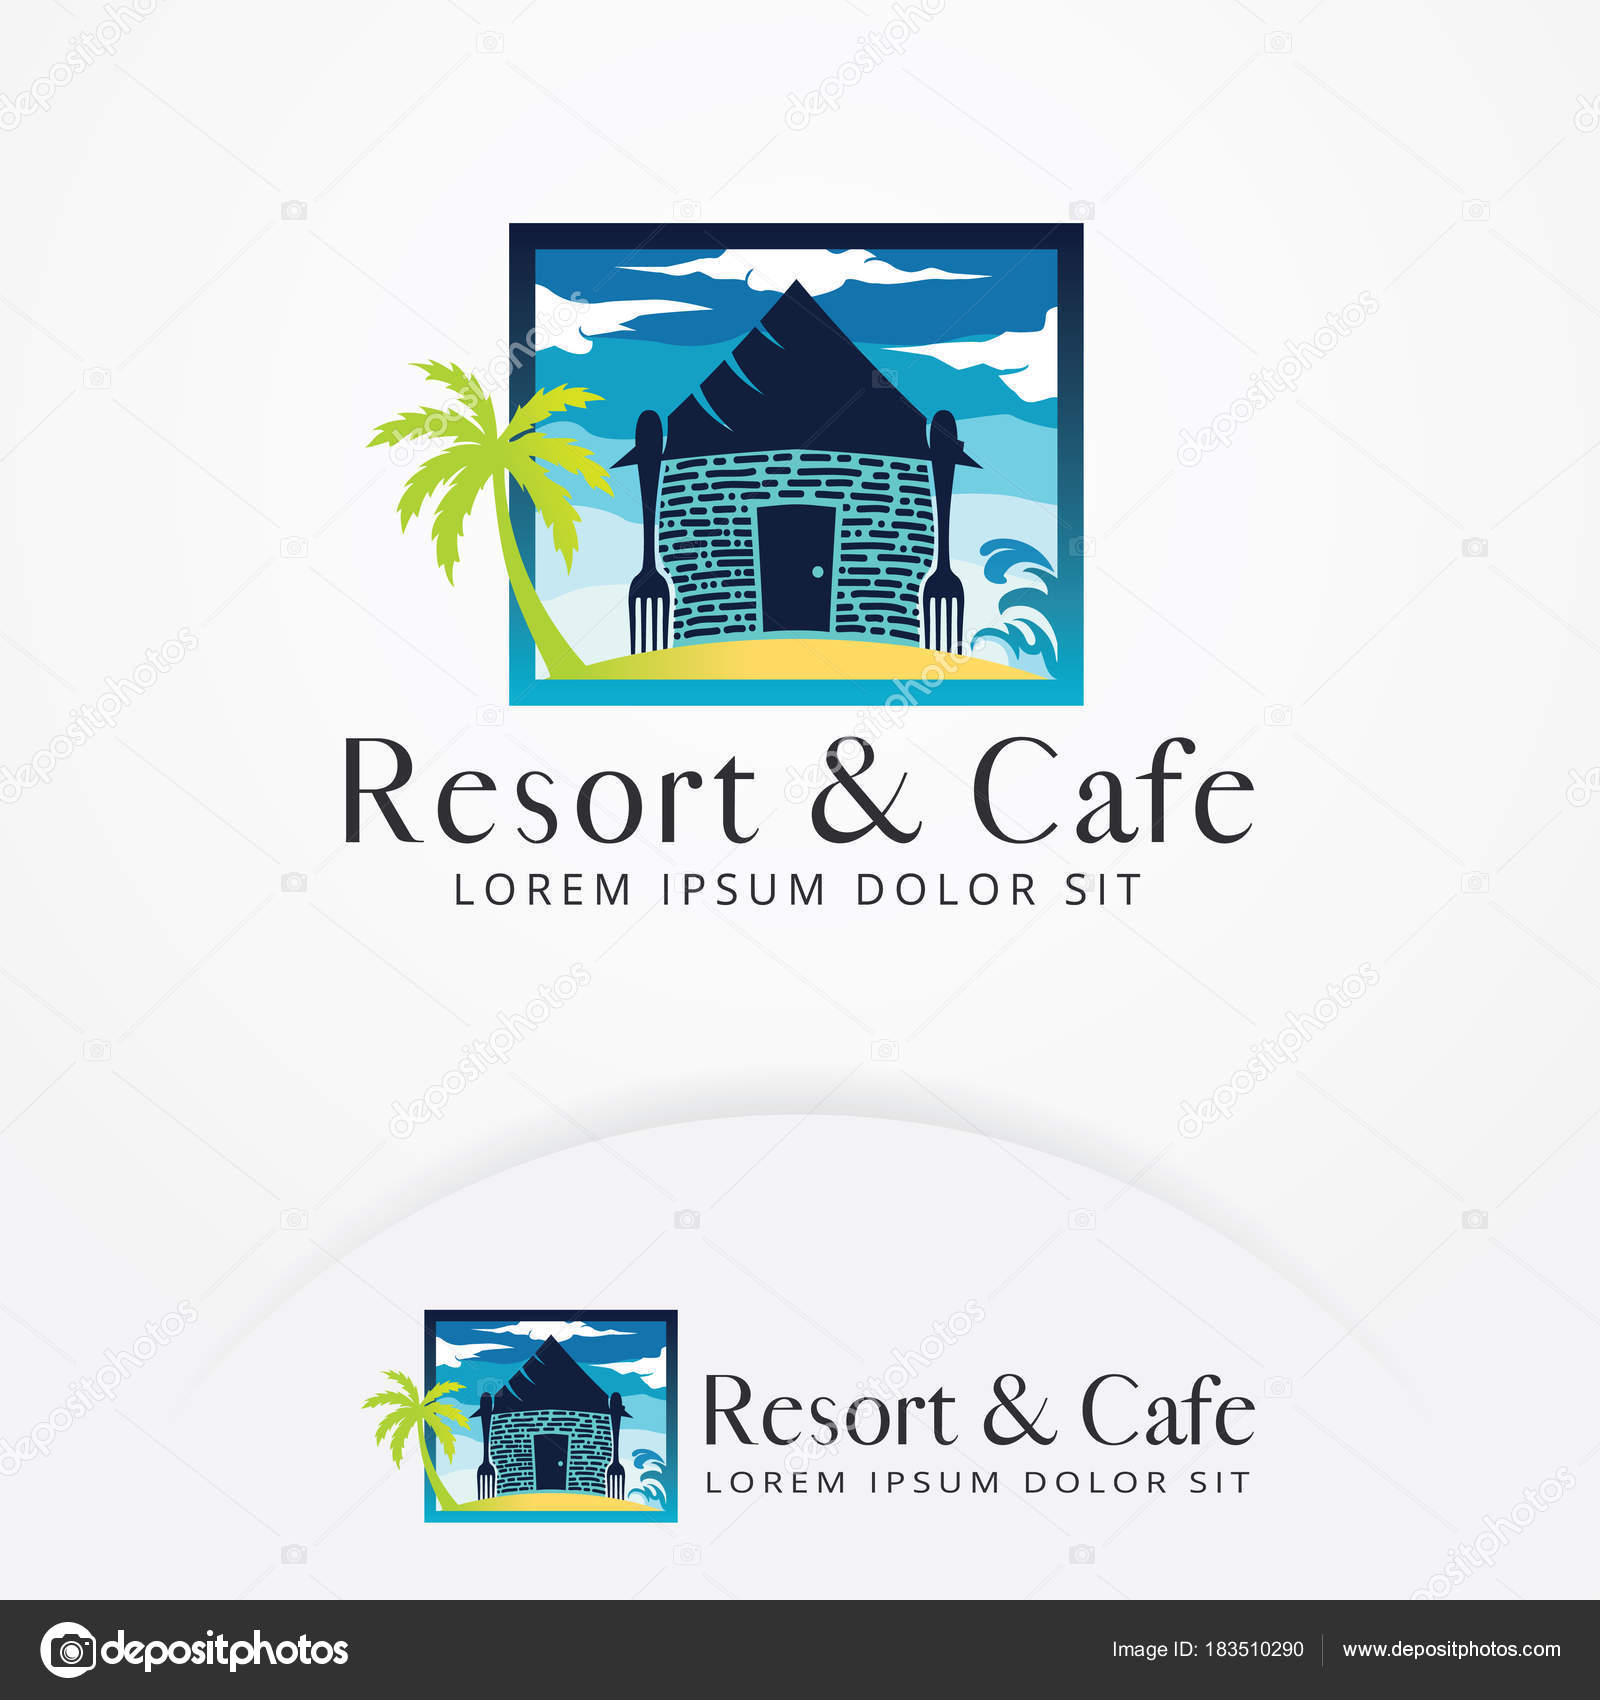 Beach Resort Logo Design Cafe Restaurant Icon Emblem Logo Vector Stock Vector C Irfanfirdaus19 Yahoo Com 183510290